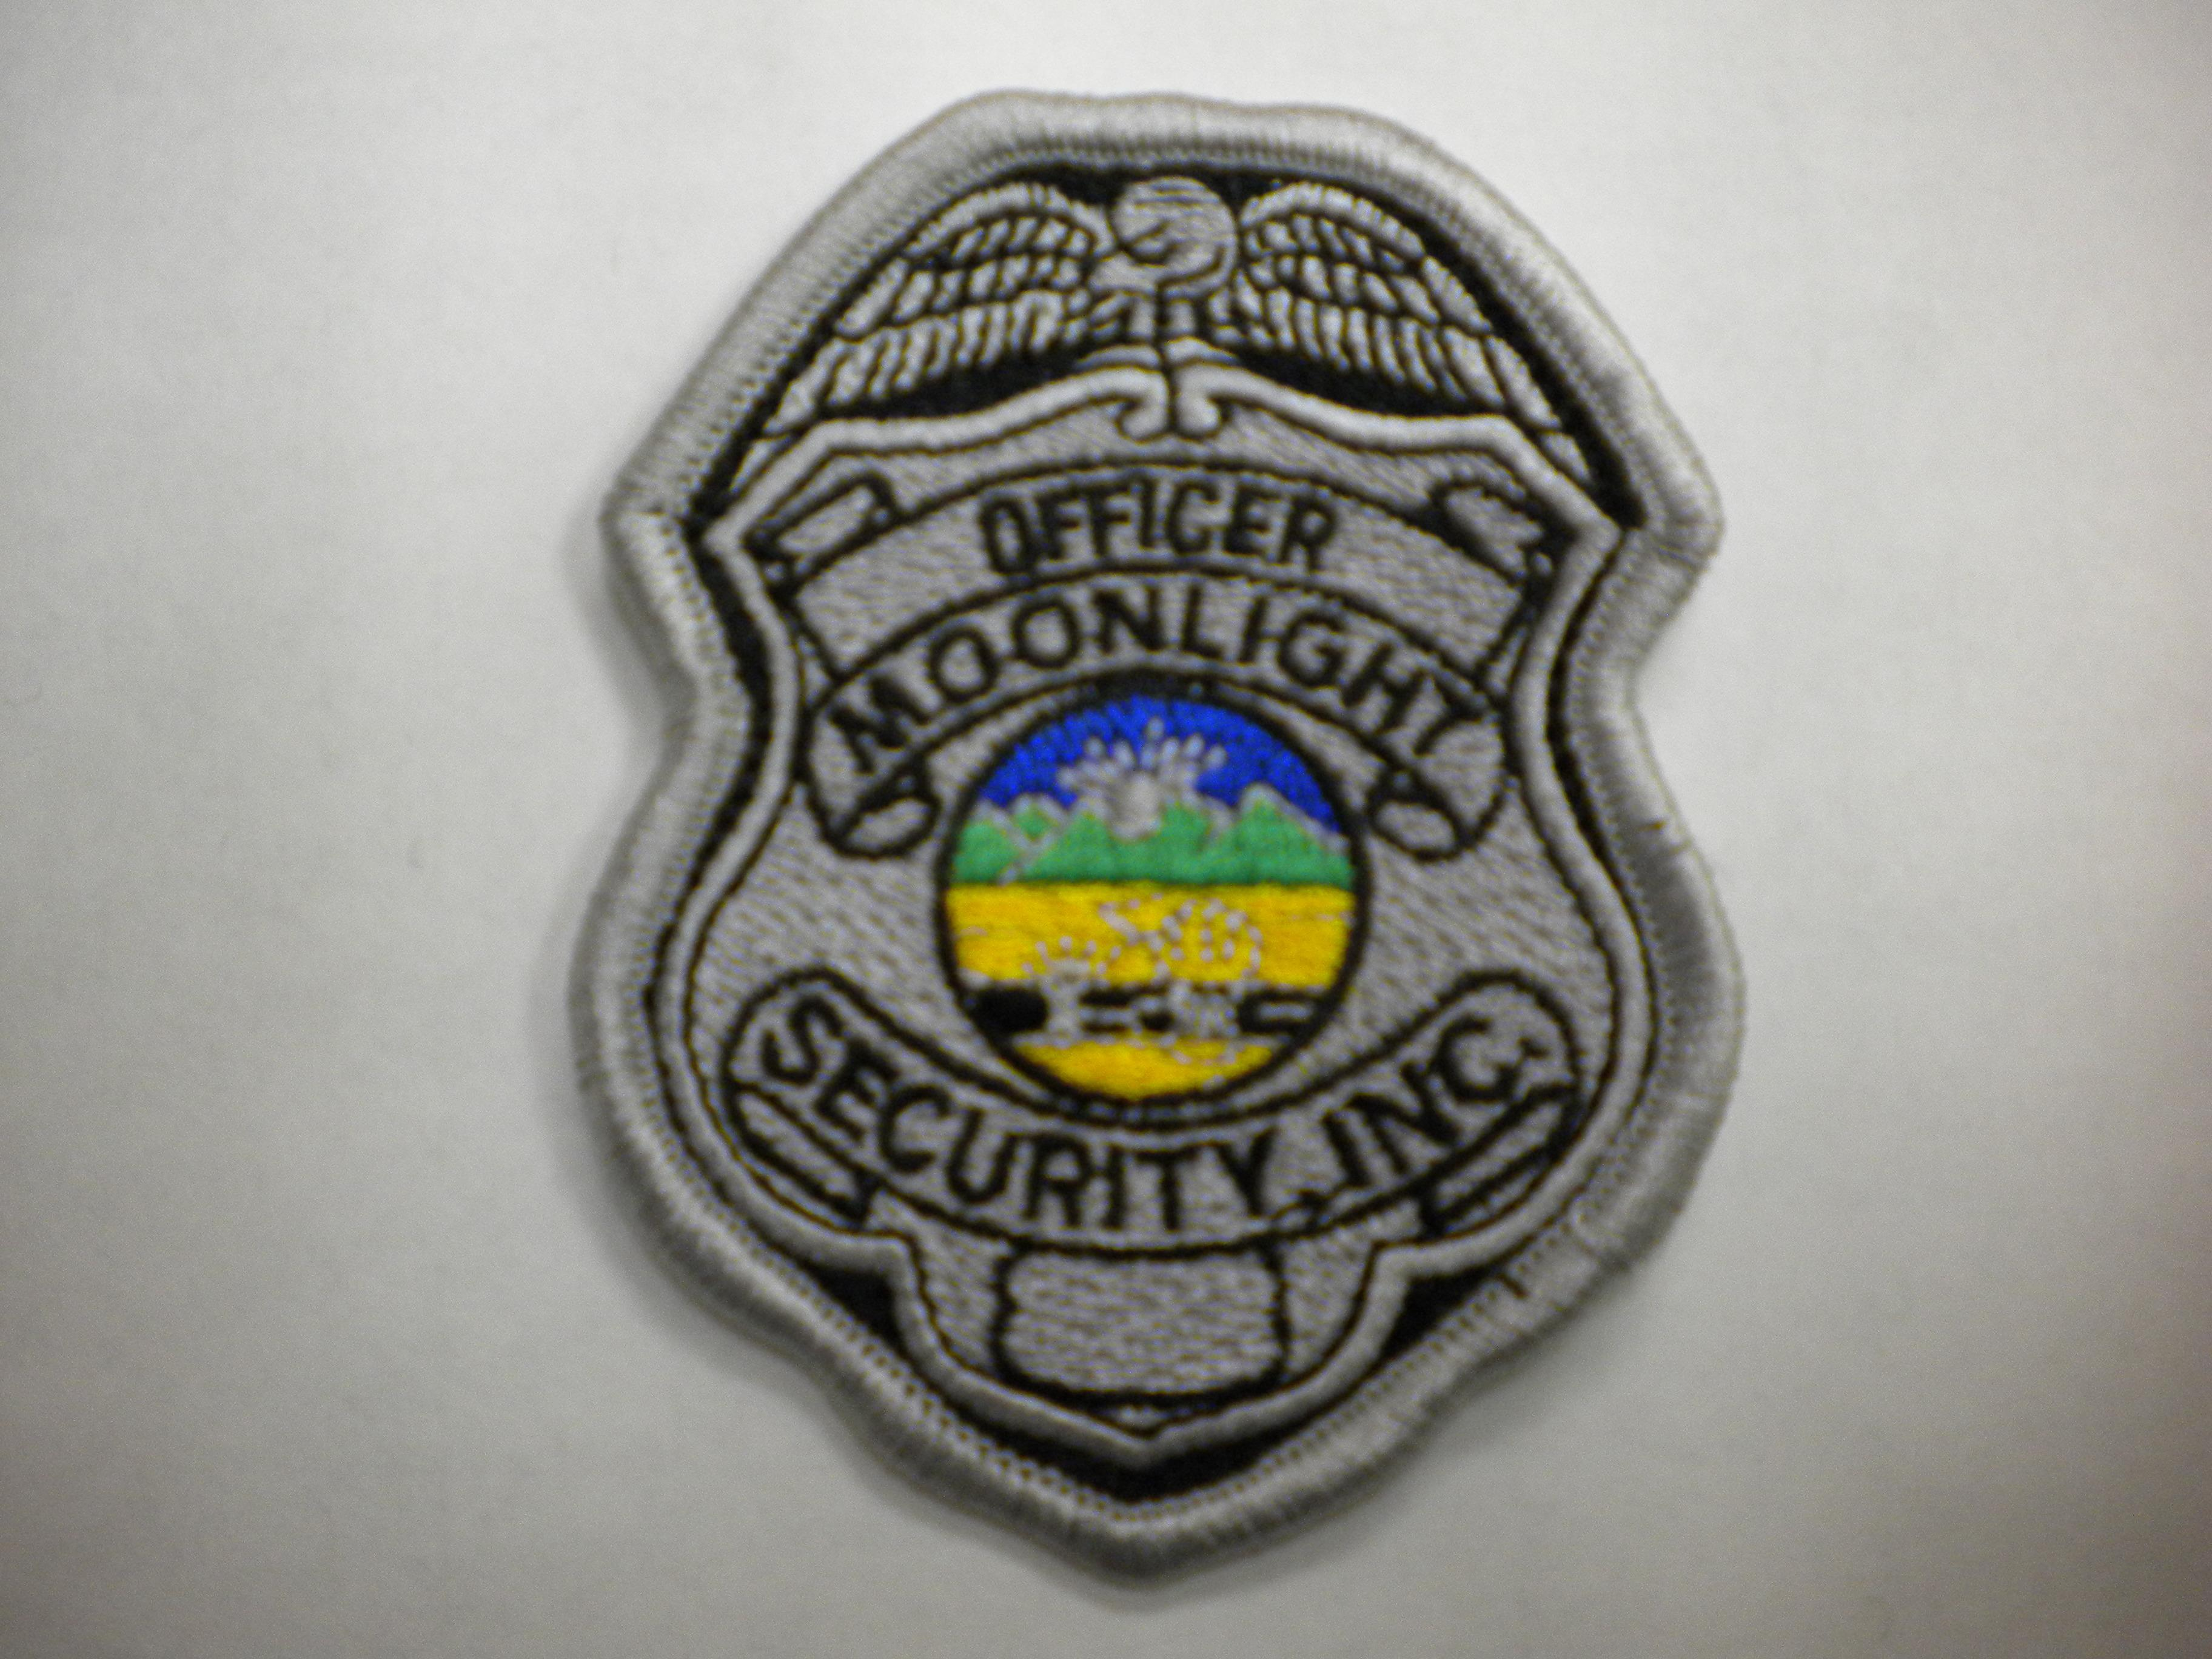 Moonlight Security, Inc.